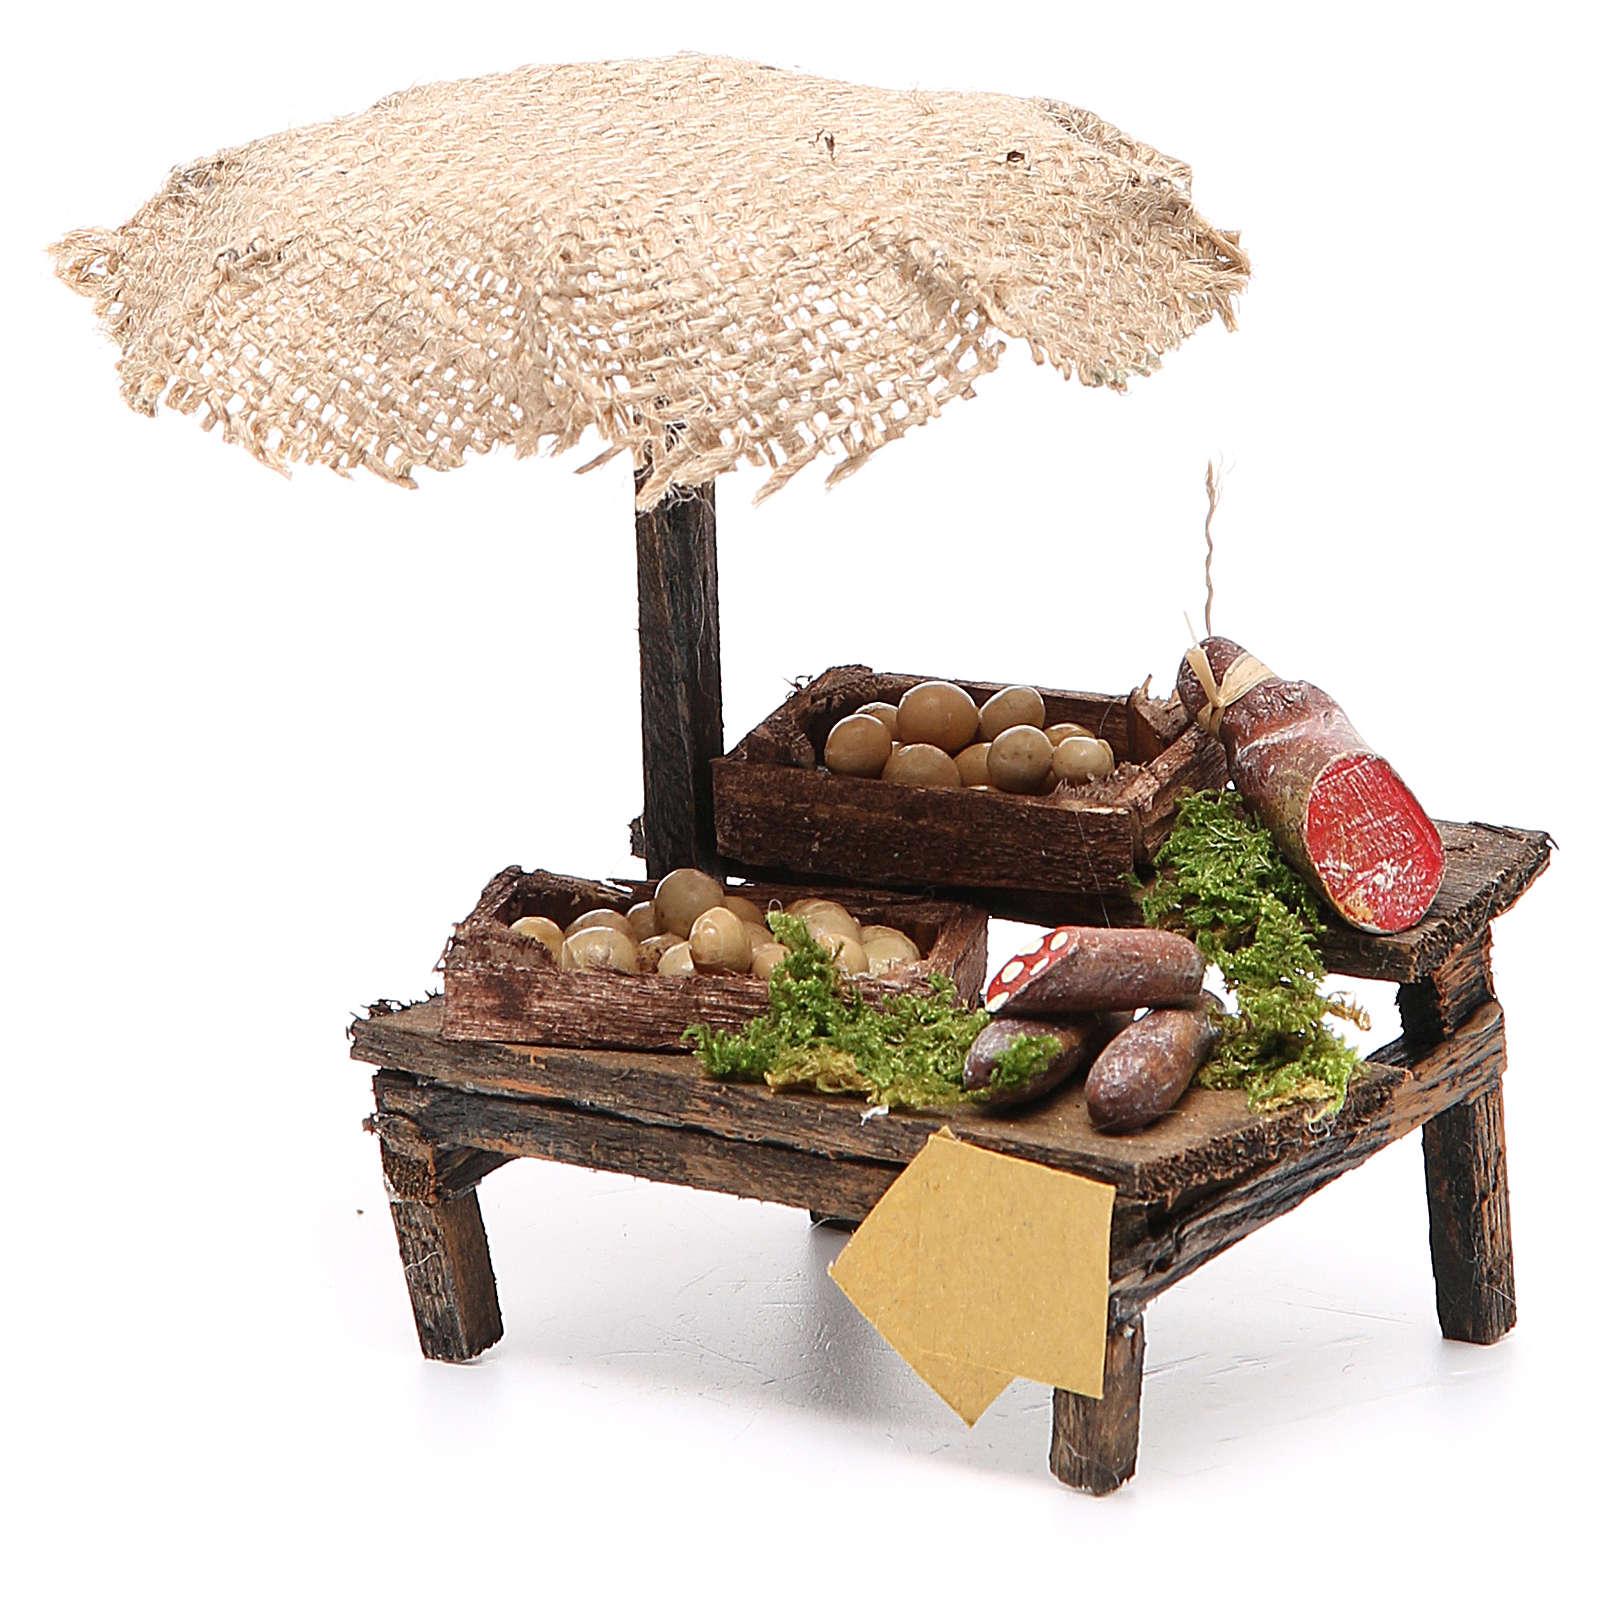 Workshop nativity with beach umbrella, cured meats 12x10x12cm 4